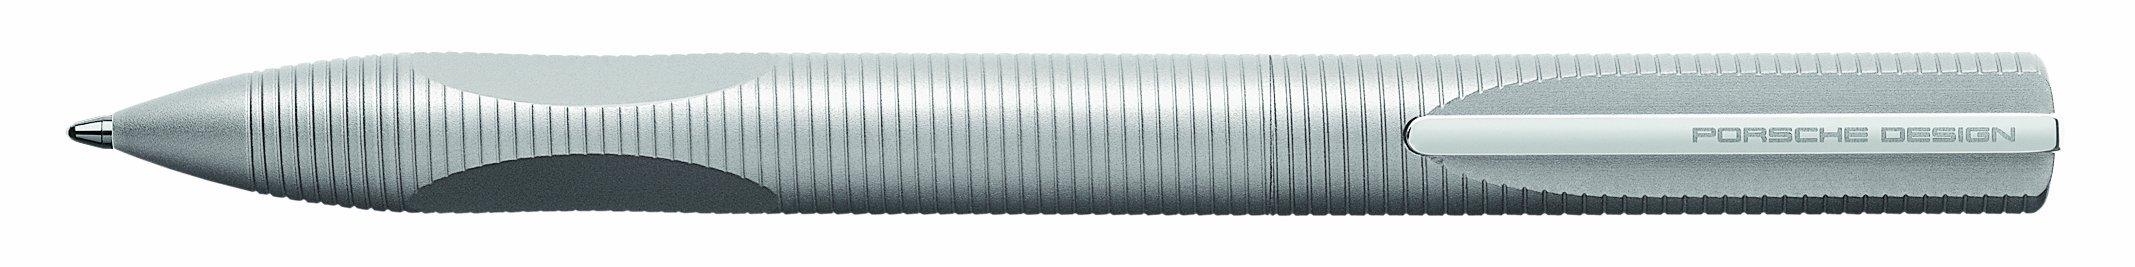 Porsche Design Aluminium Ballpoint Pen in Nature Finish (989293)